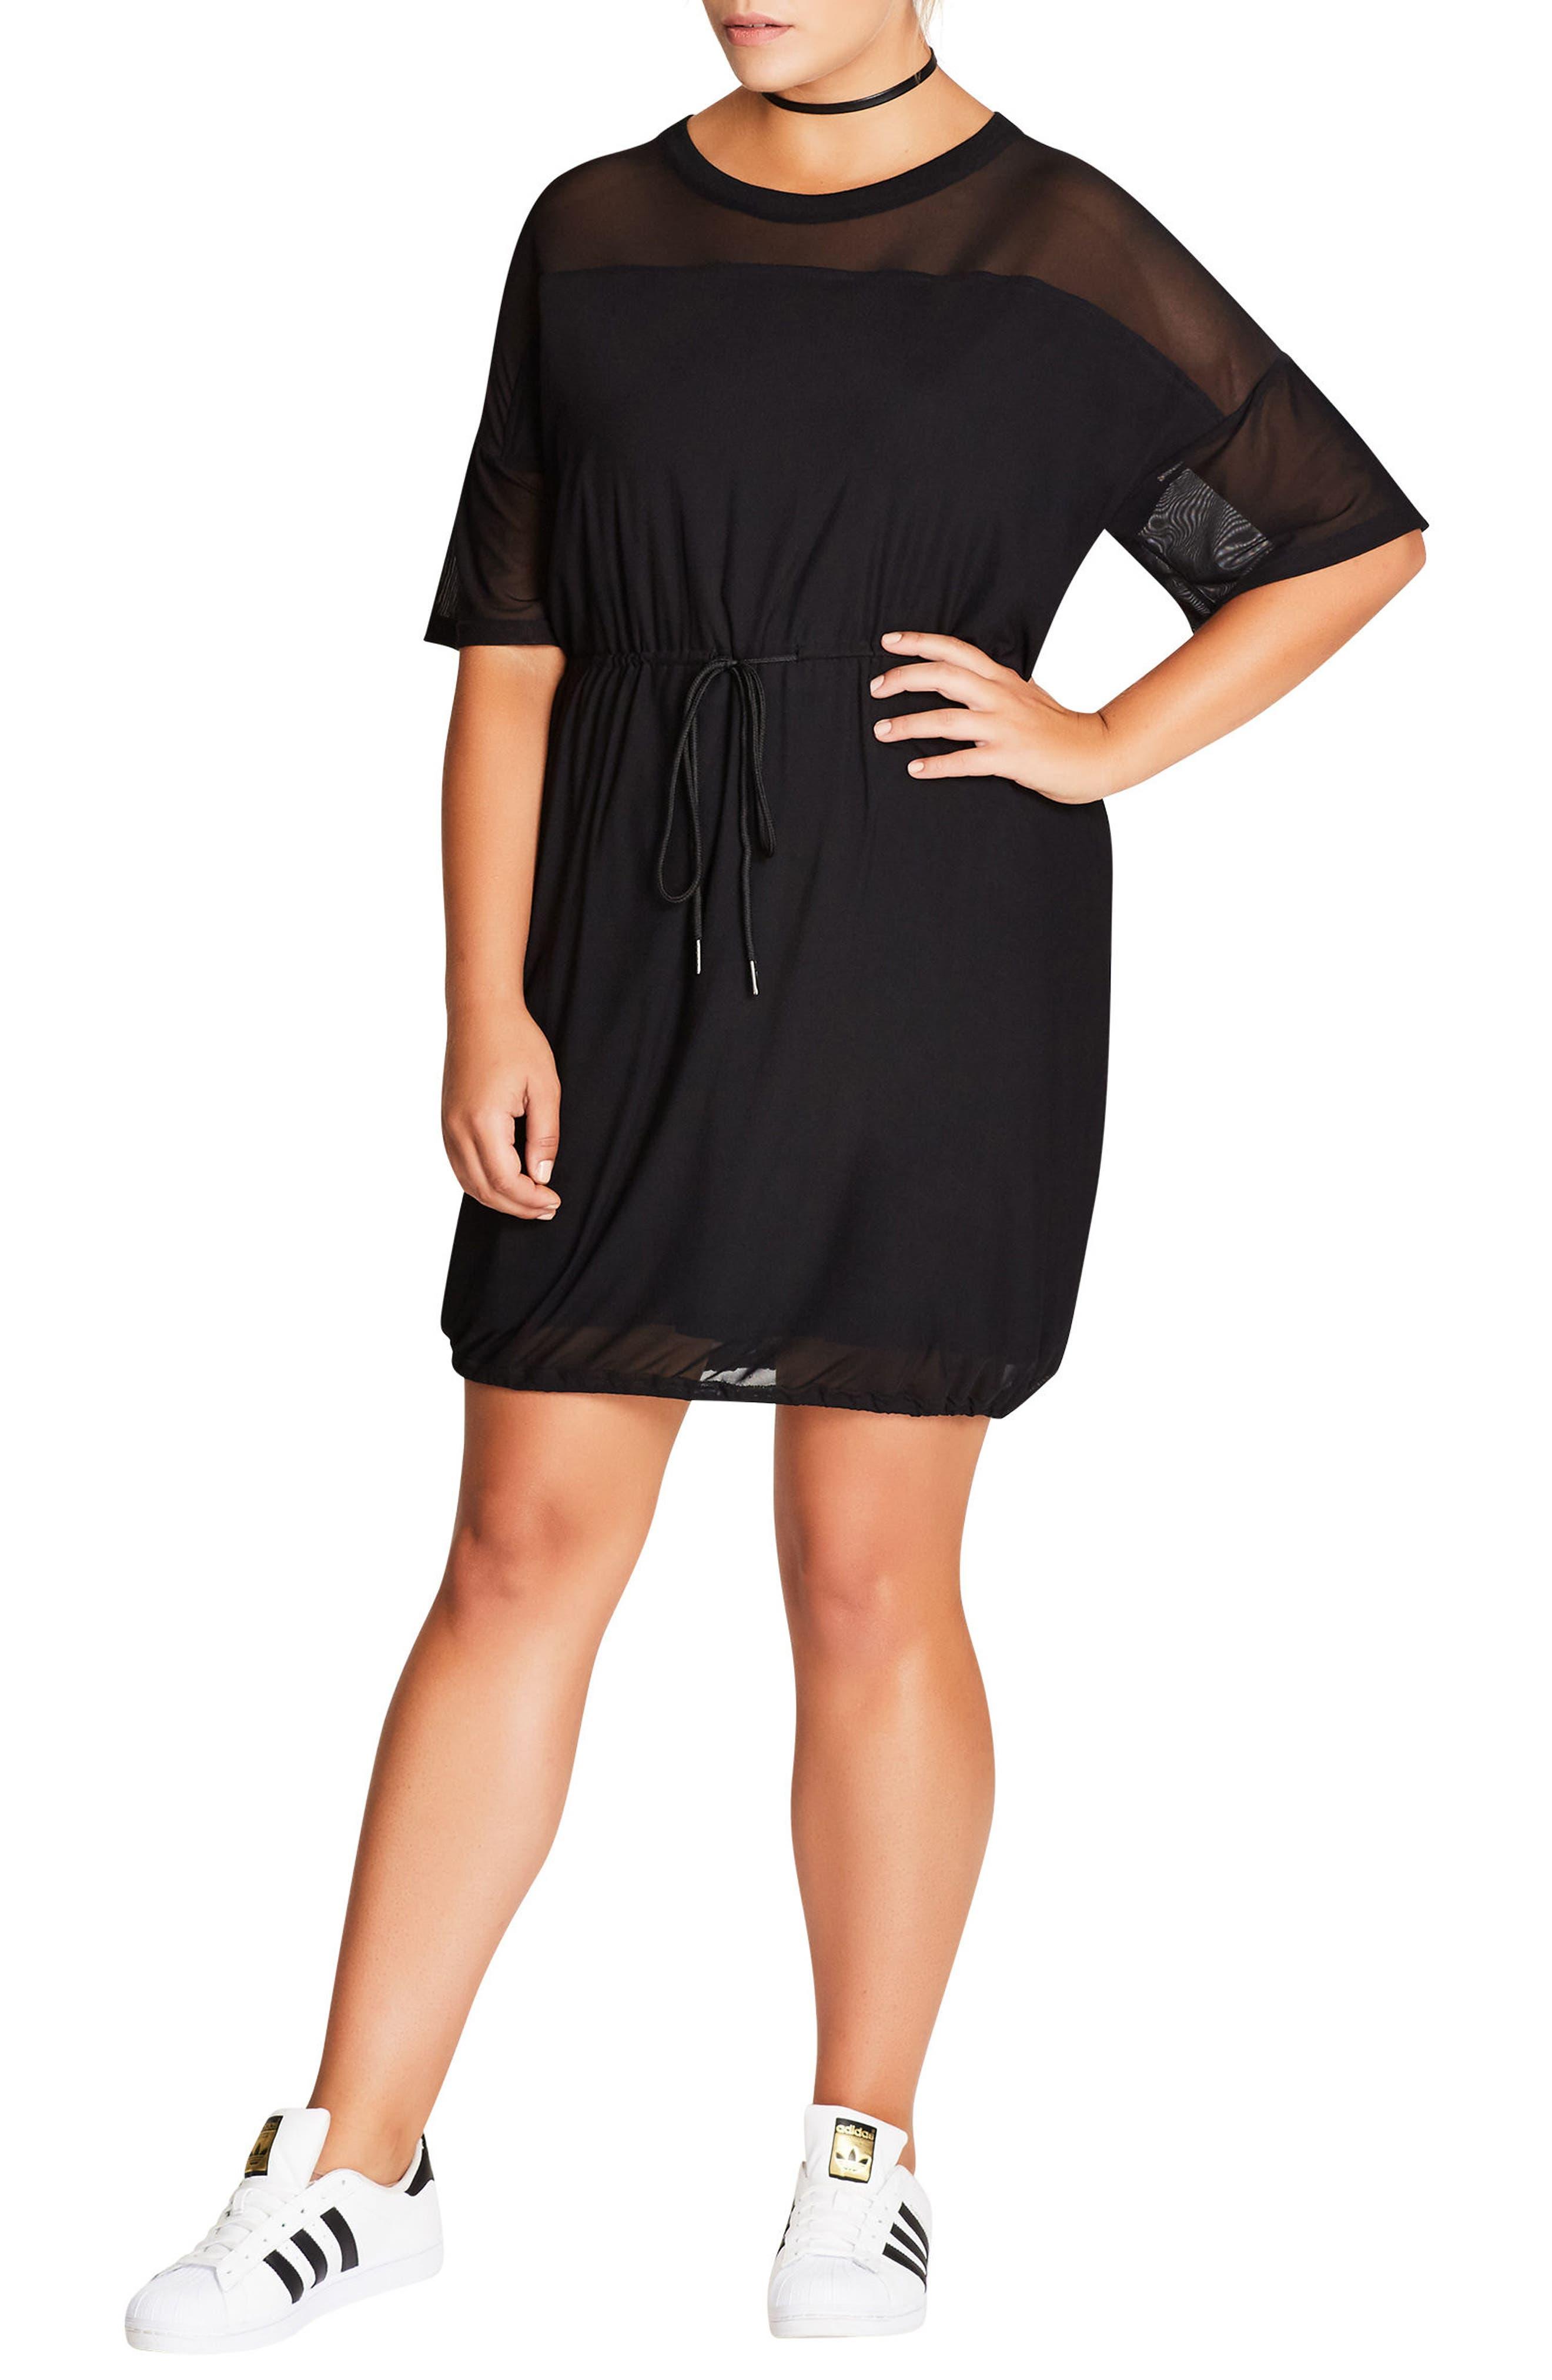 City Chic Sports One Tunic (Plus Size)